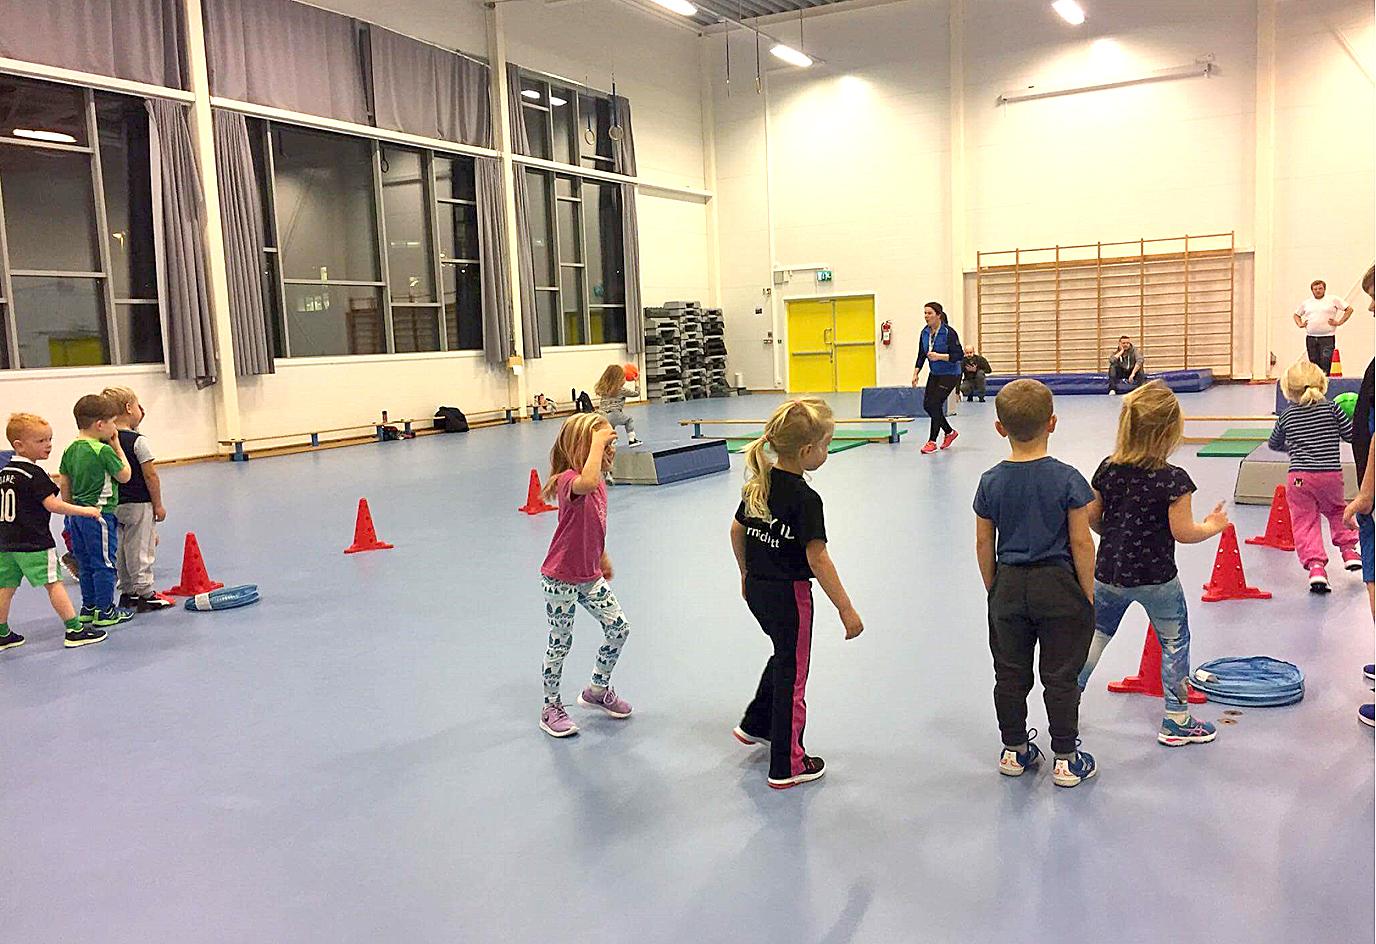 Barn i gymsal